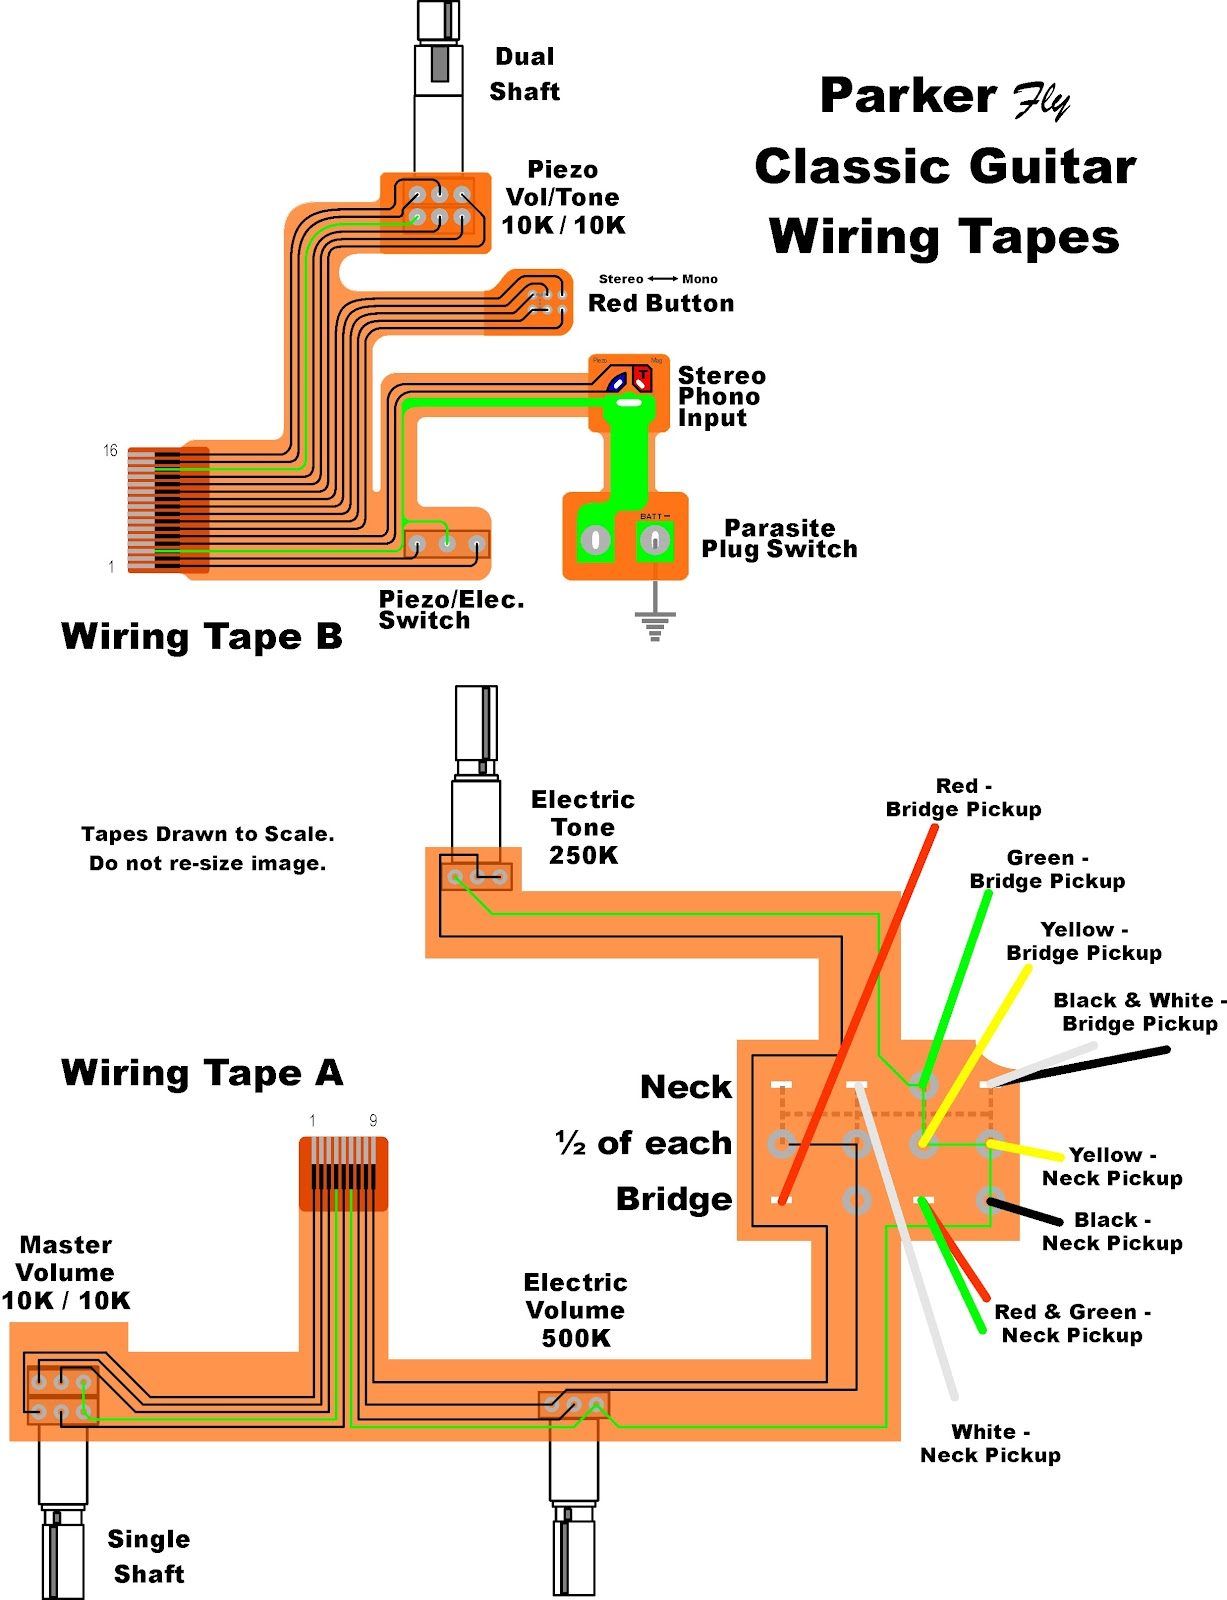 parker guitars wiring diagrams kingston teisco guitars wiring diagrams